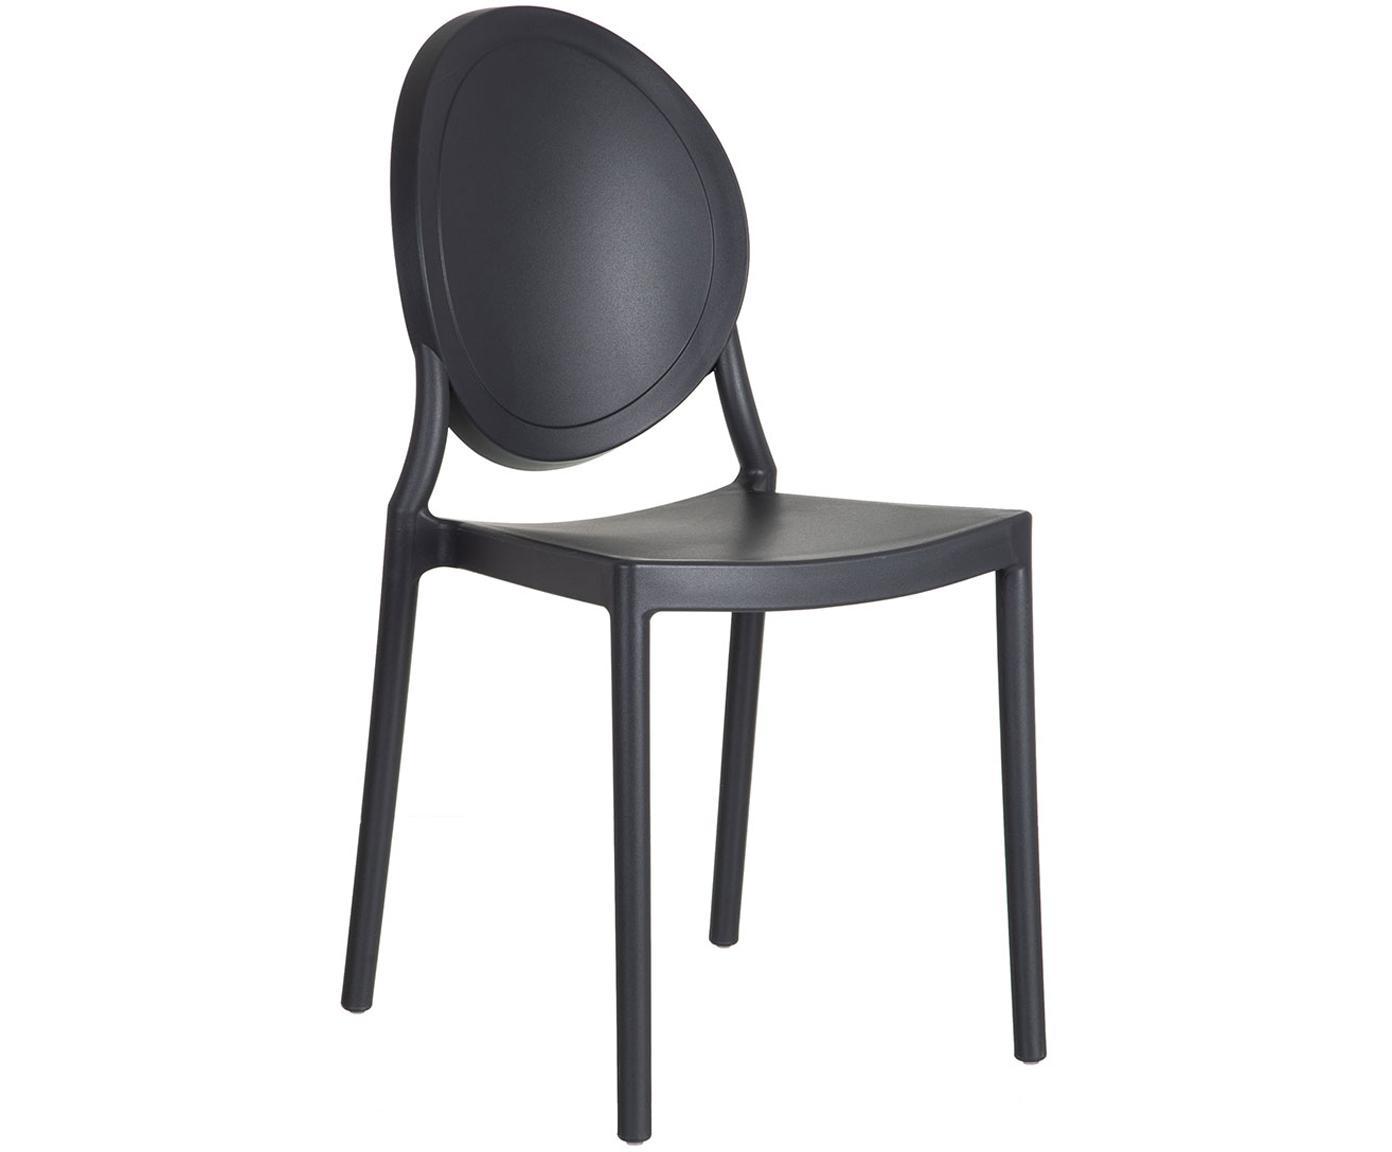 Silla Binster, Polipropileno, Negro, An 41 x Al 87 cm